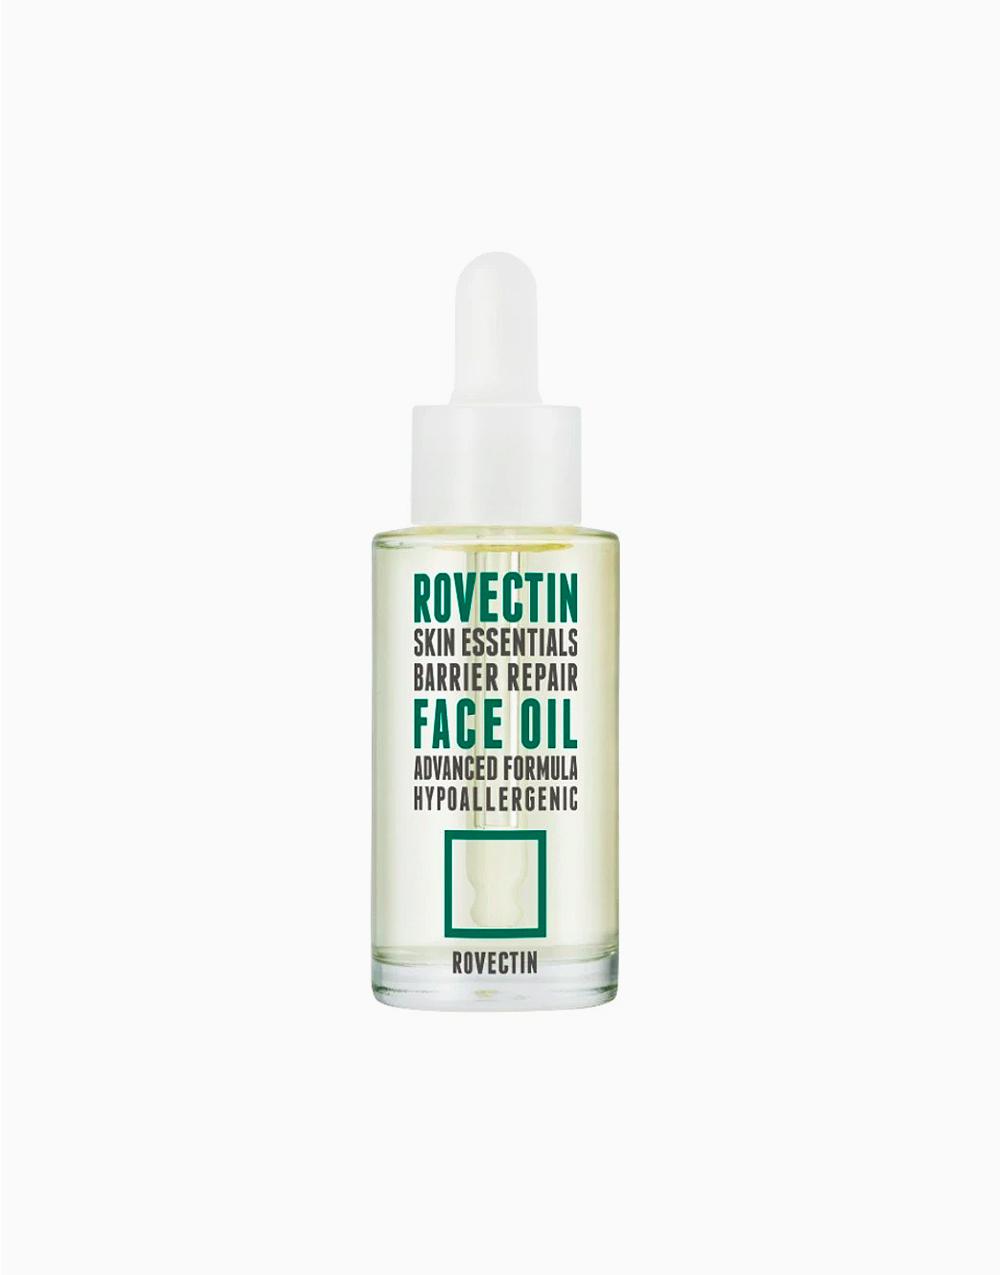 Skin Essentials Barrier Repair Face Oil by Rovectin